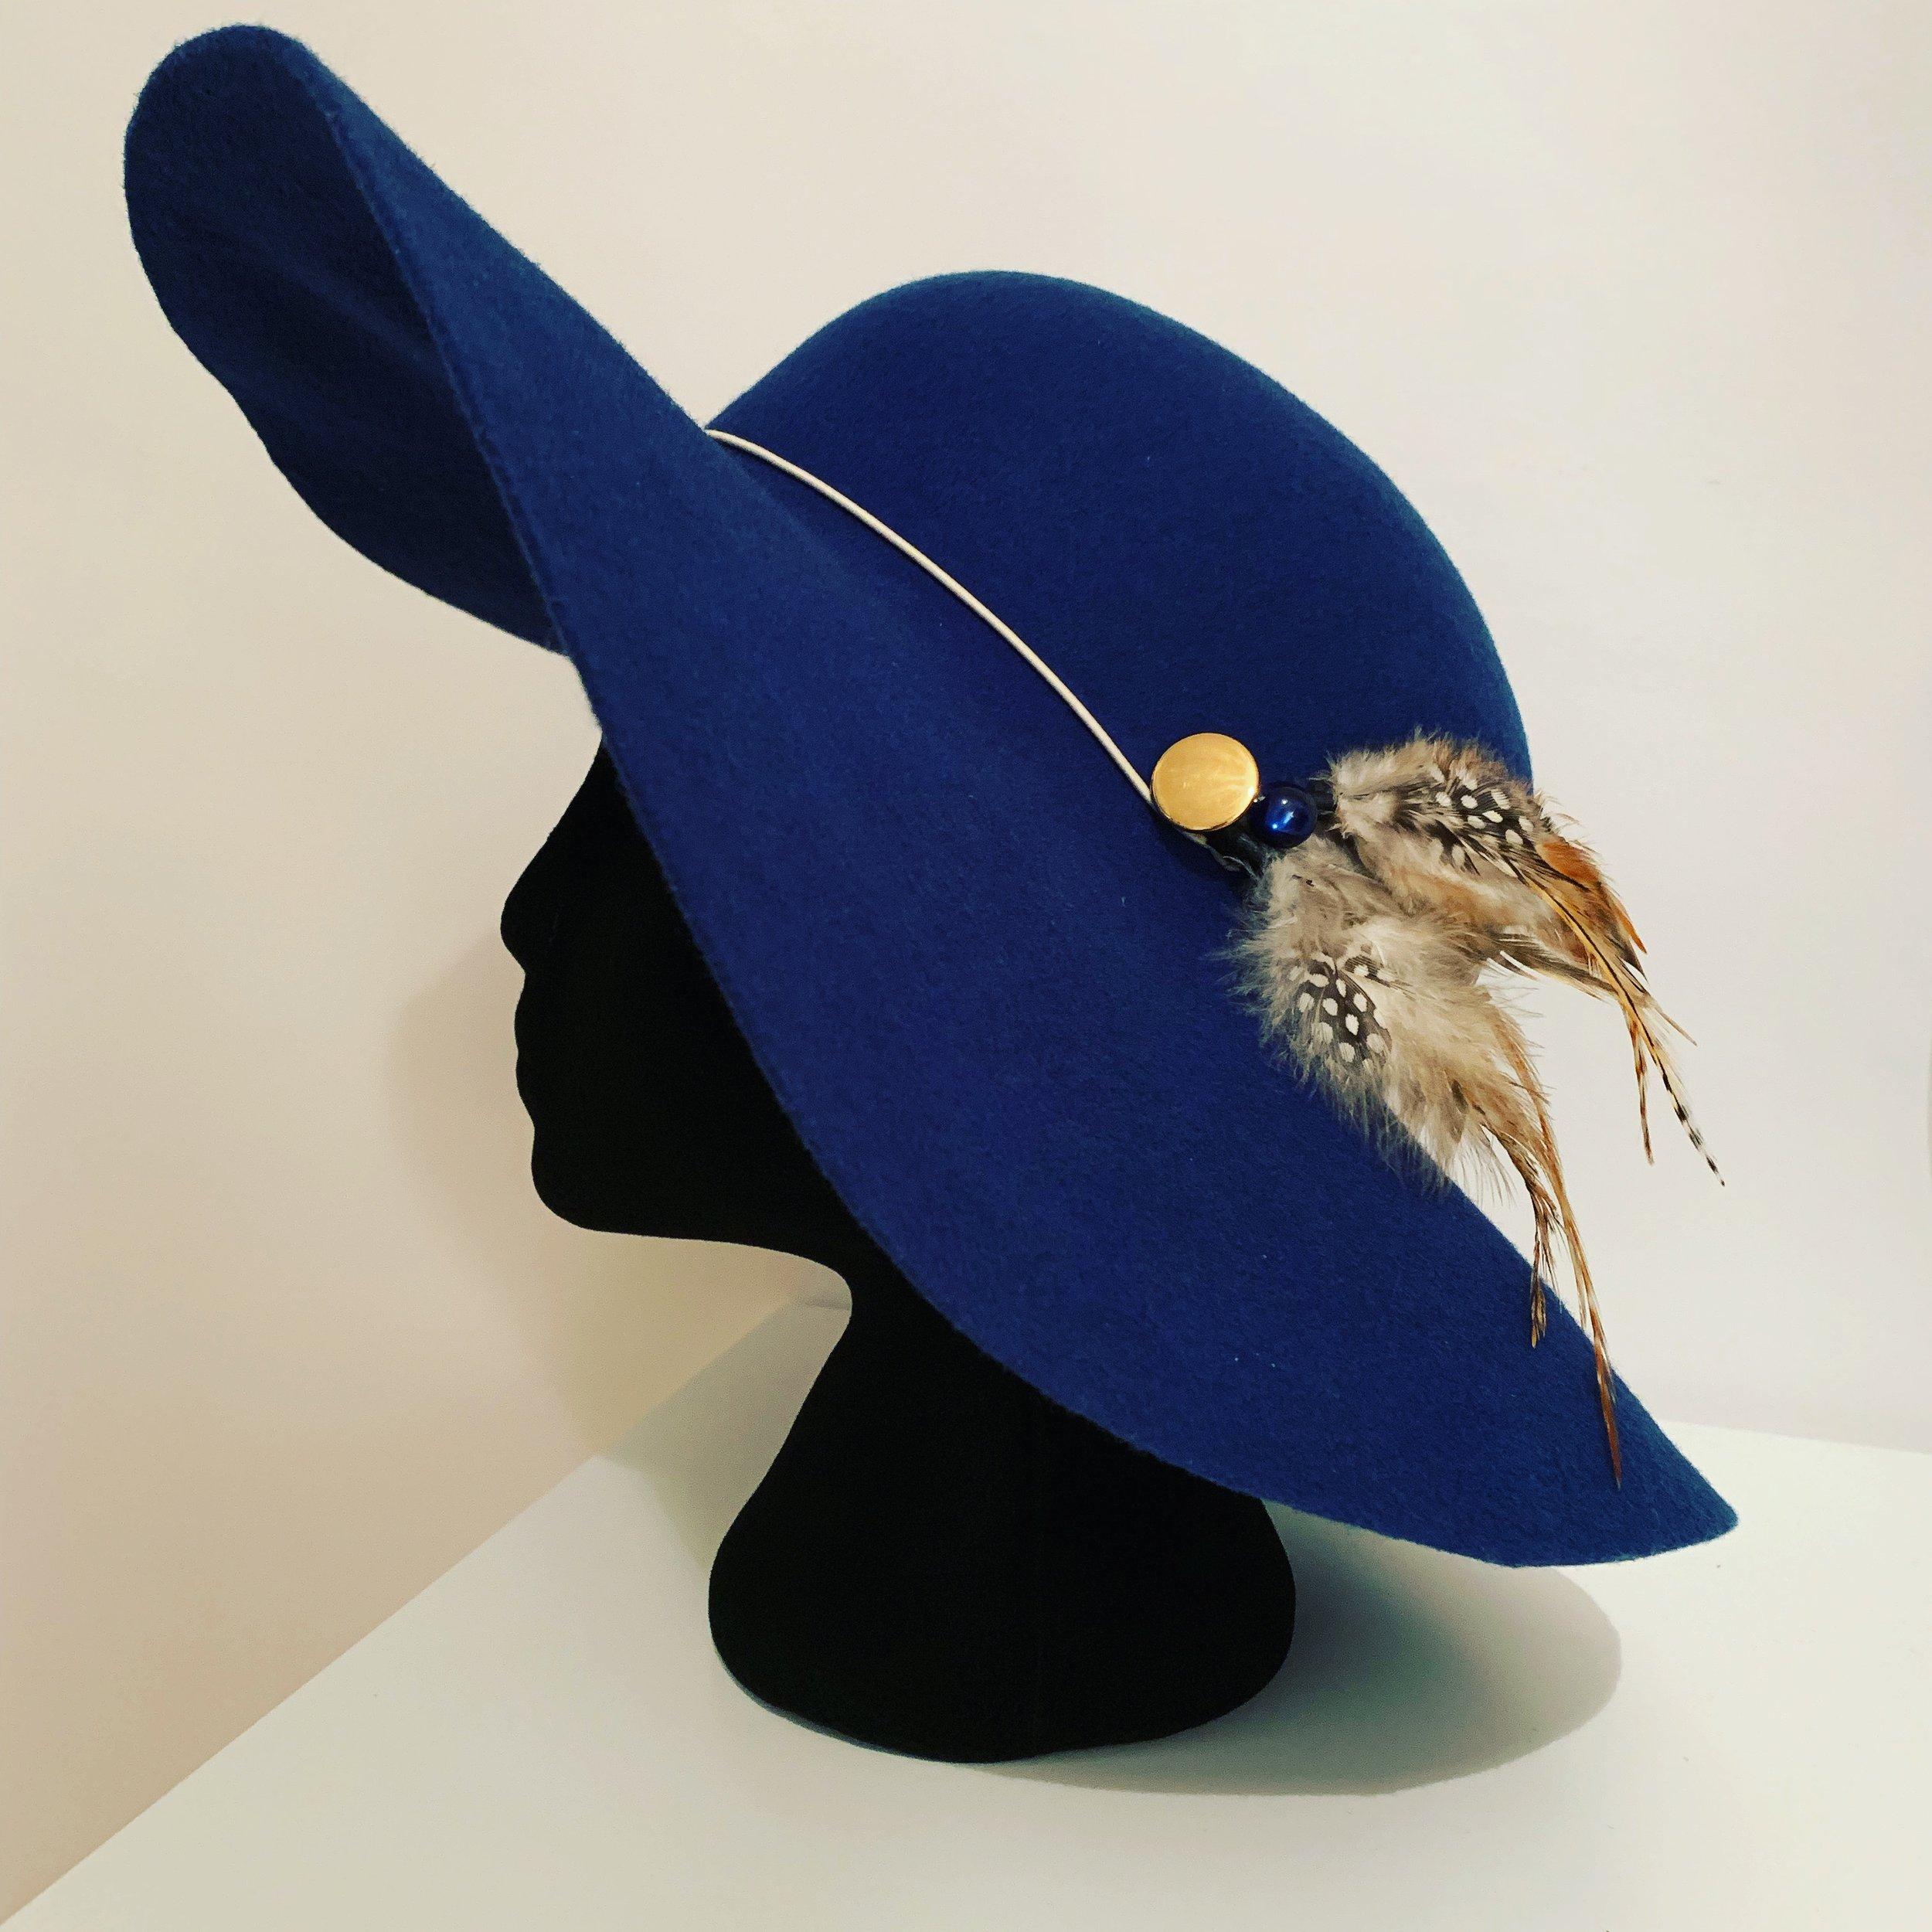 Cheeky Hats